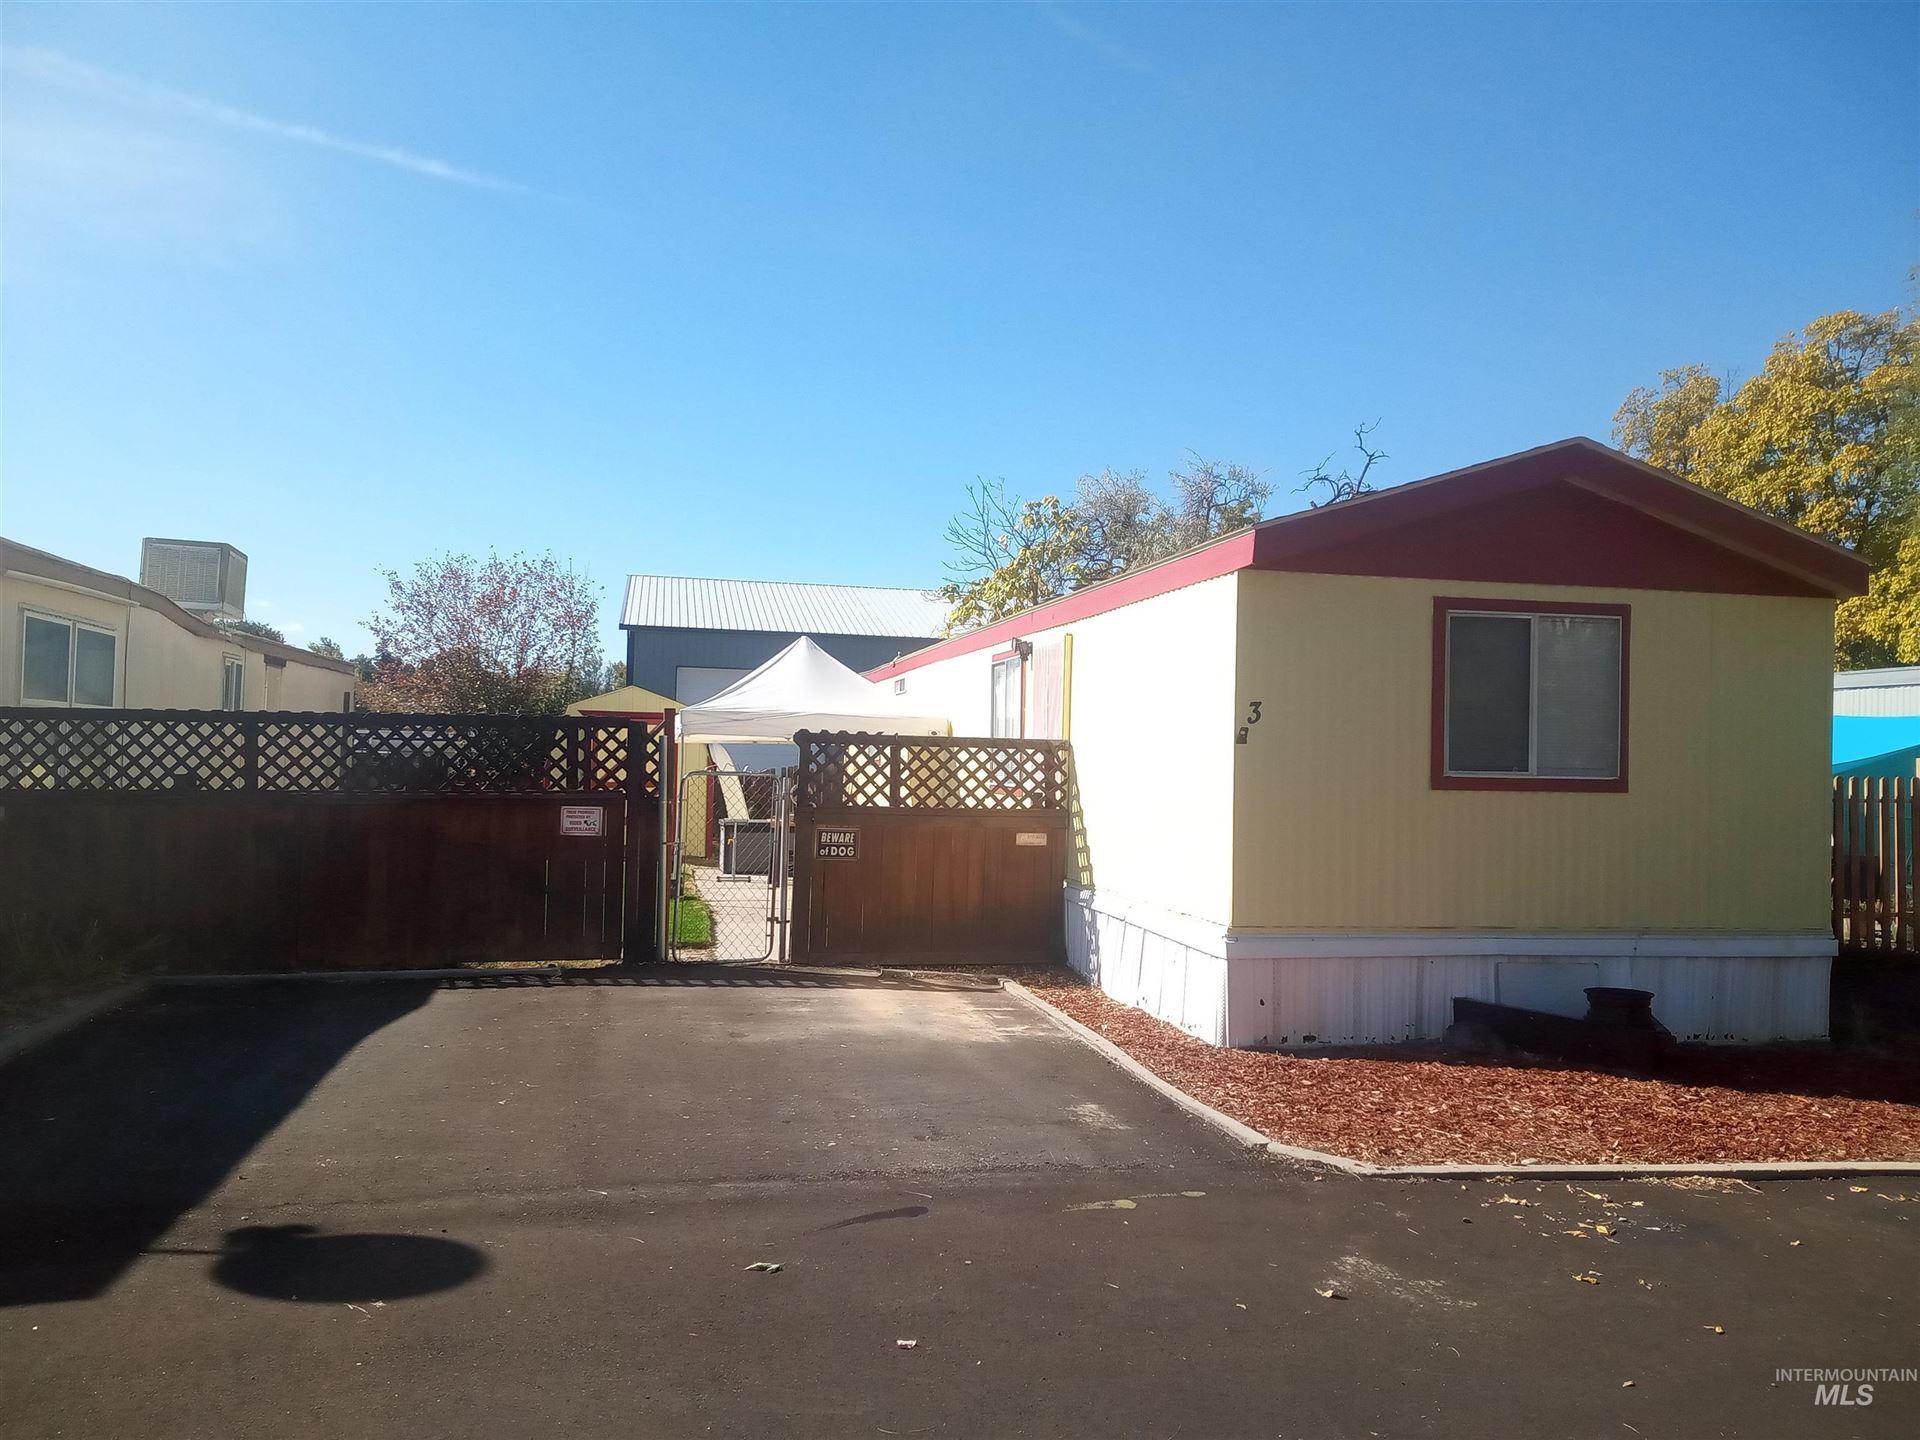 207 E 40th #3, Garden City, ID 83714 - MLS#: 98822425